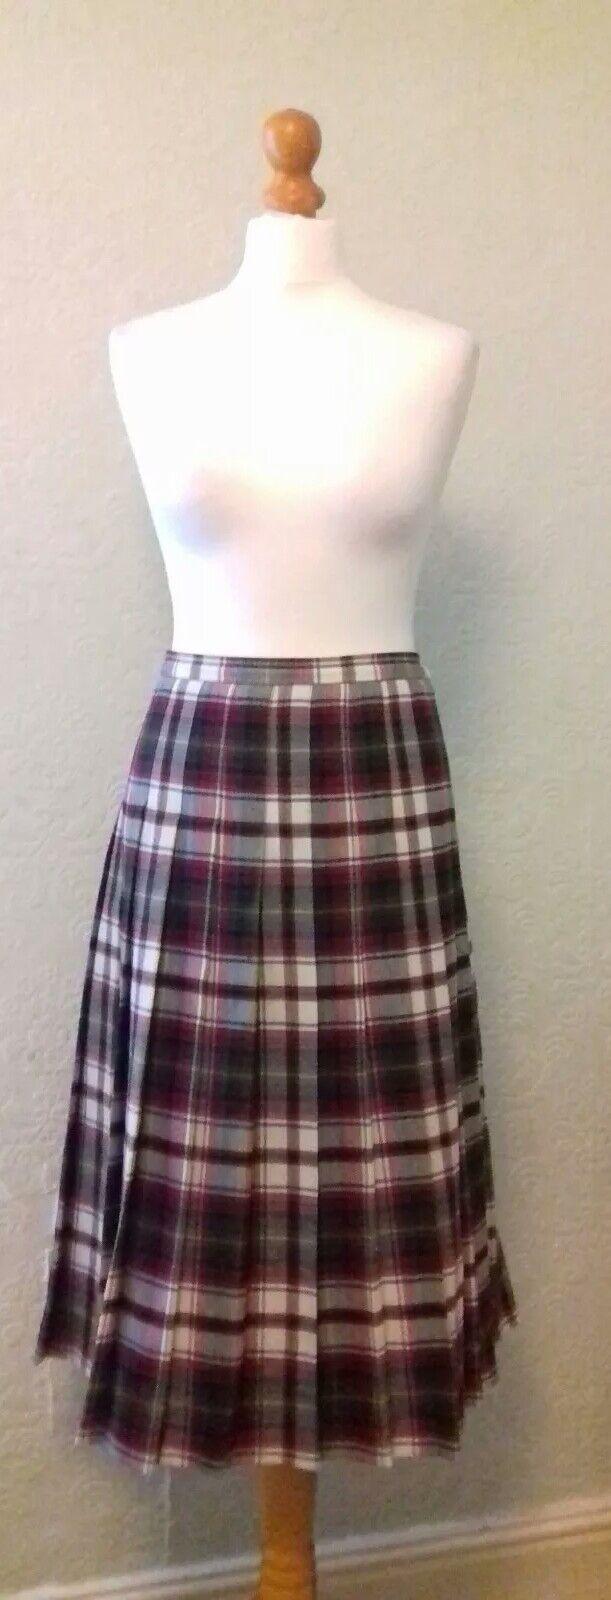 Tartan Skirt. Vintage . Size 18 UK.Made in Scotland Immaculate .100% Wool .(B30)